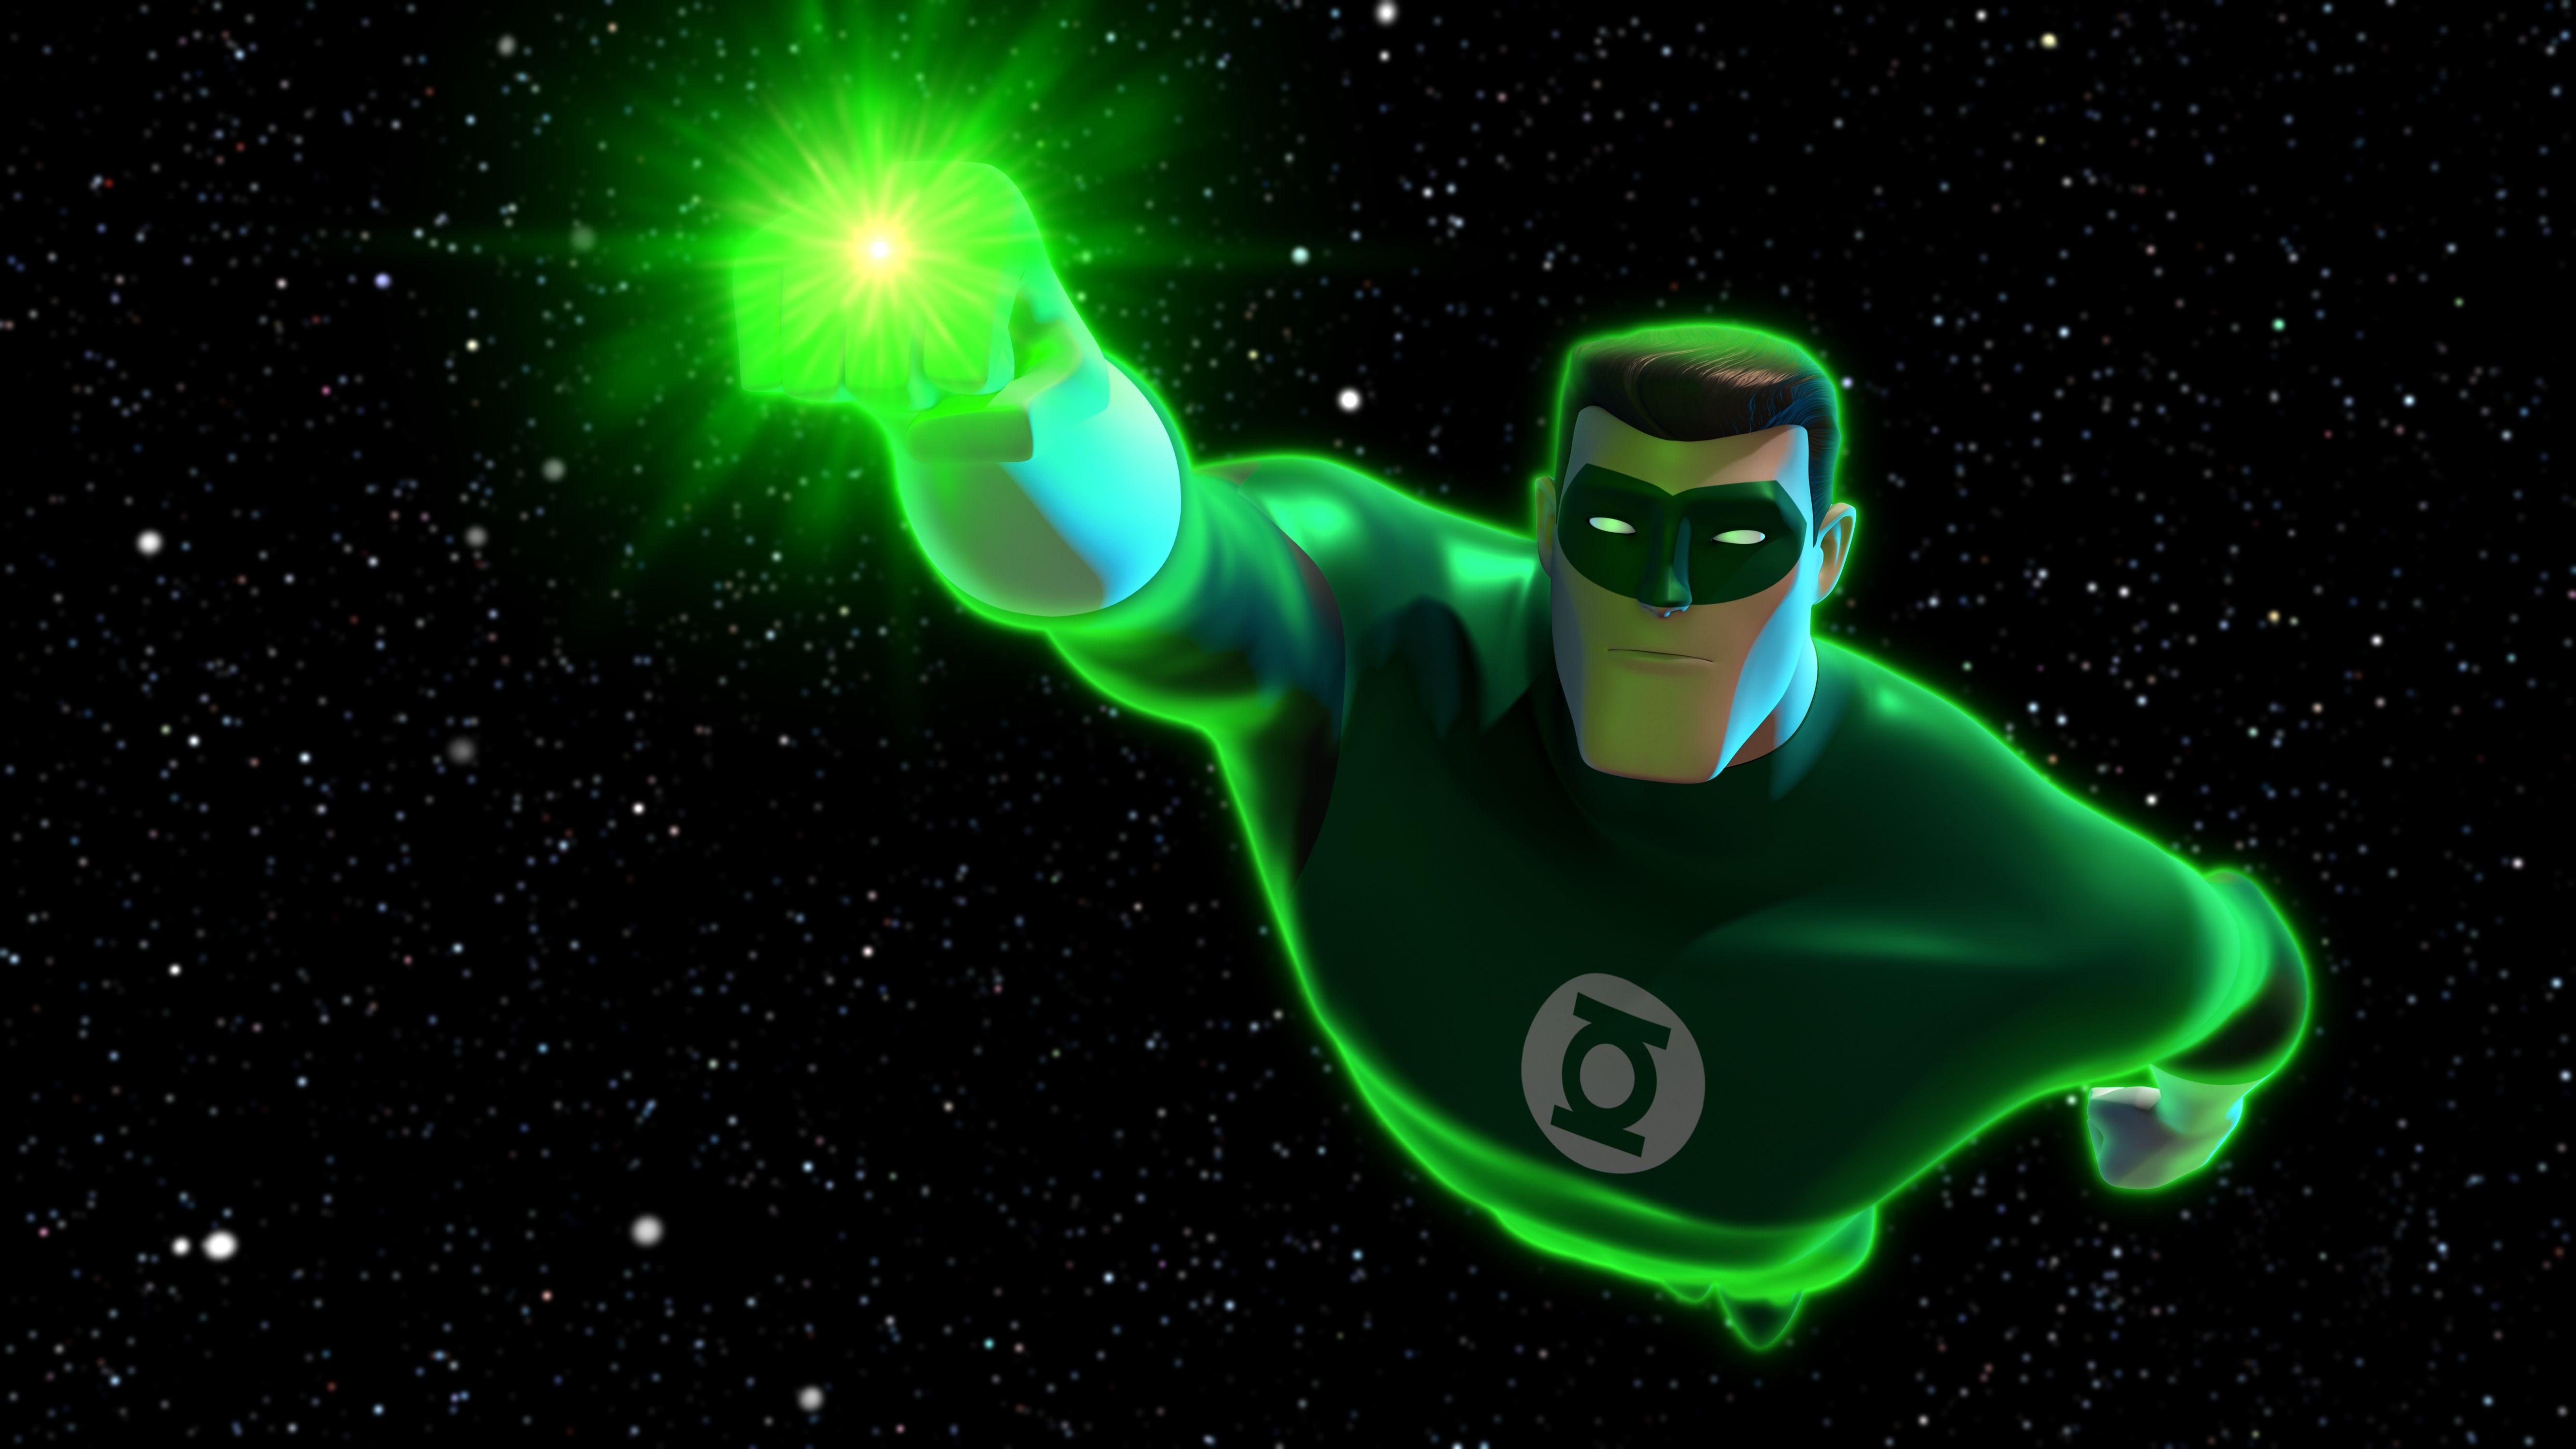 Green Lantern the Animated Series Green lantern the animated 5333x3000